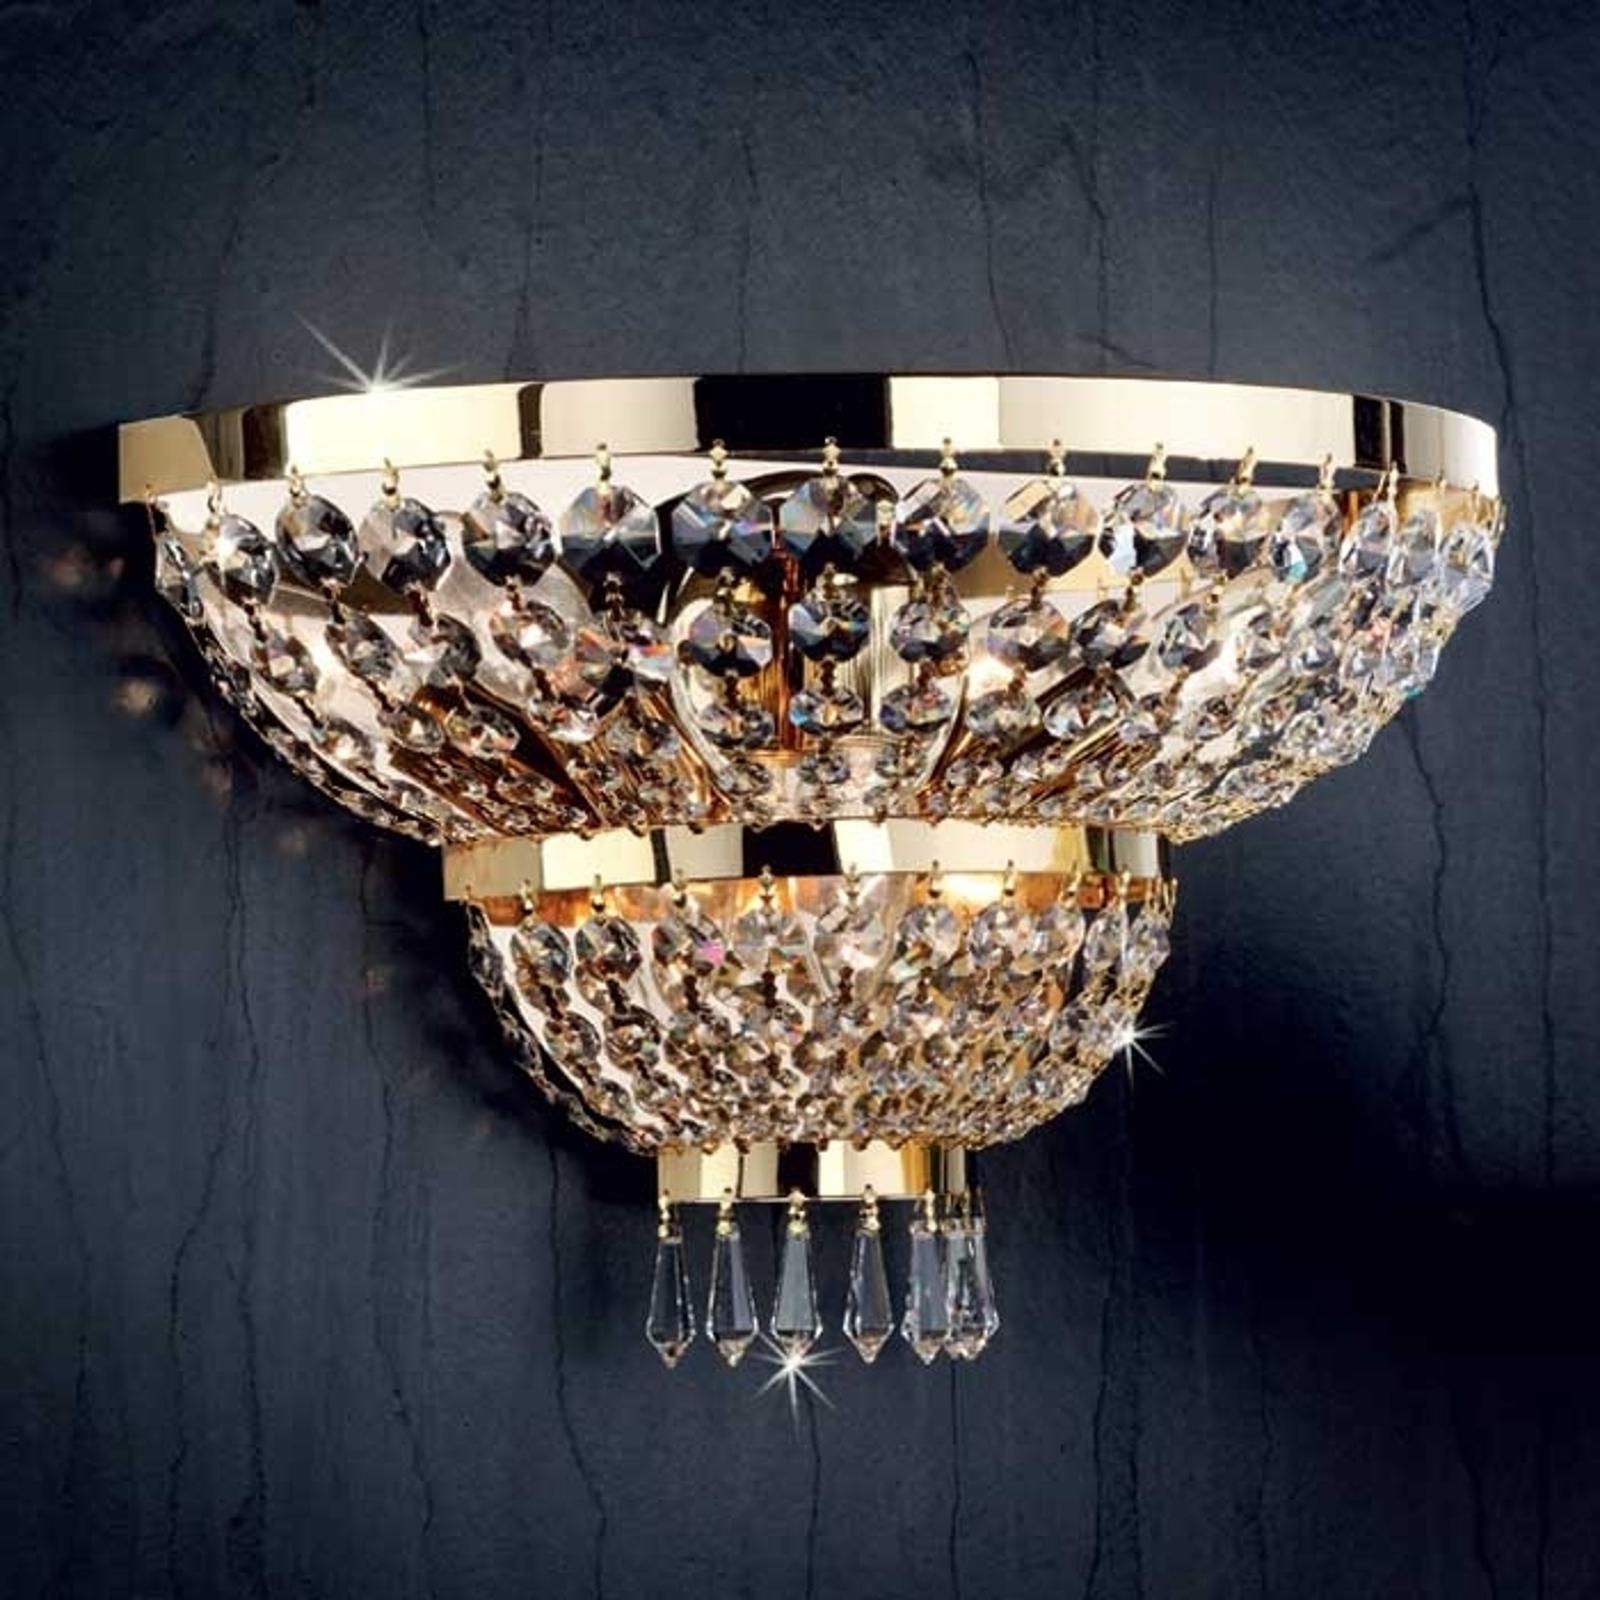 Wandlamp SHERATON 24k verguld, 3-lichts